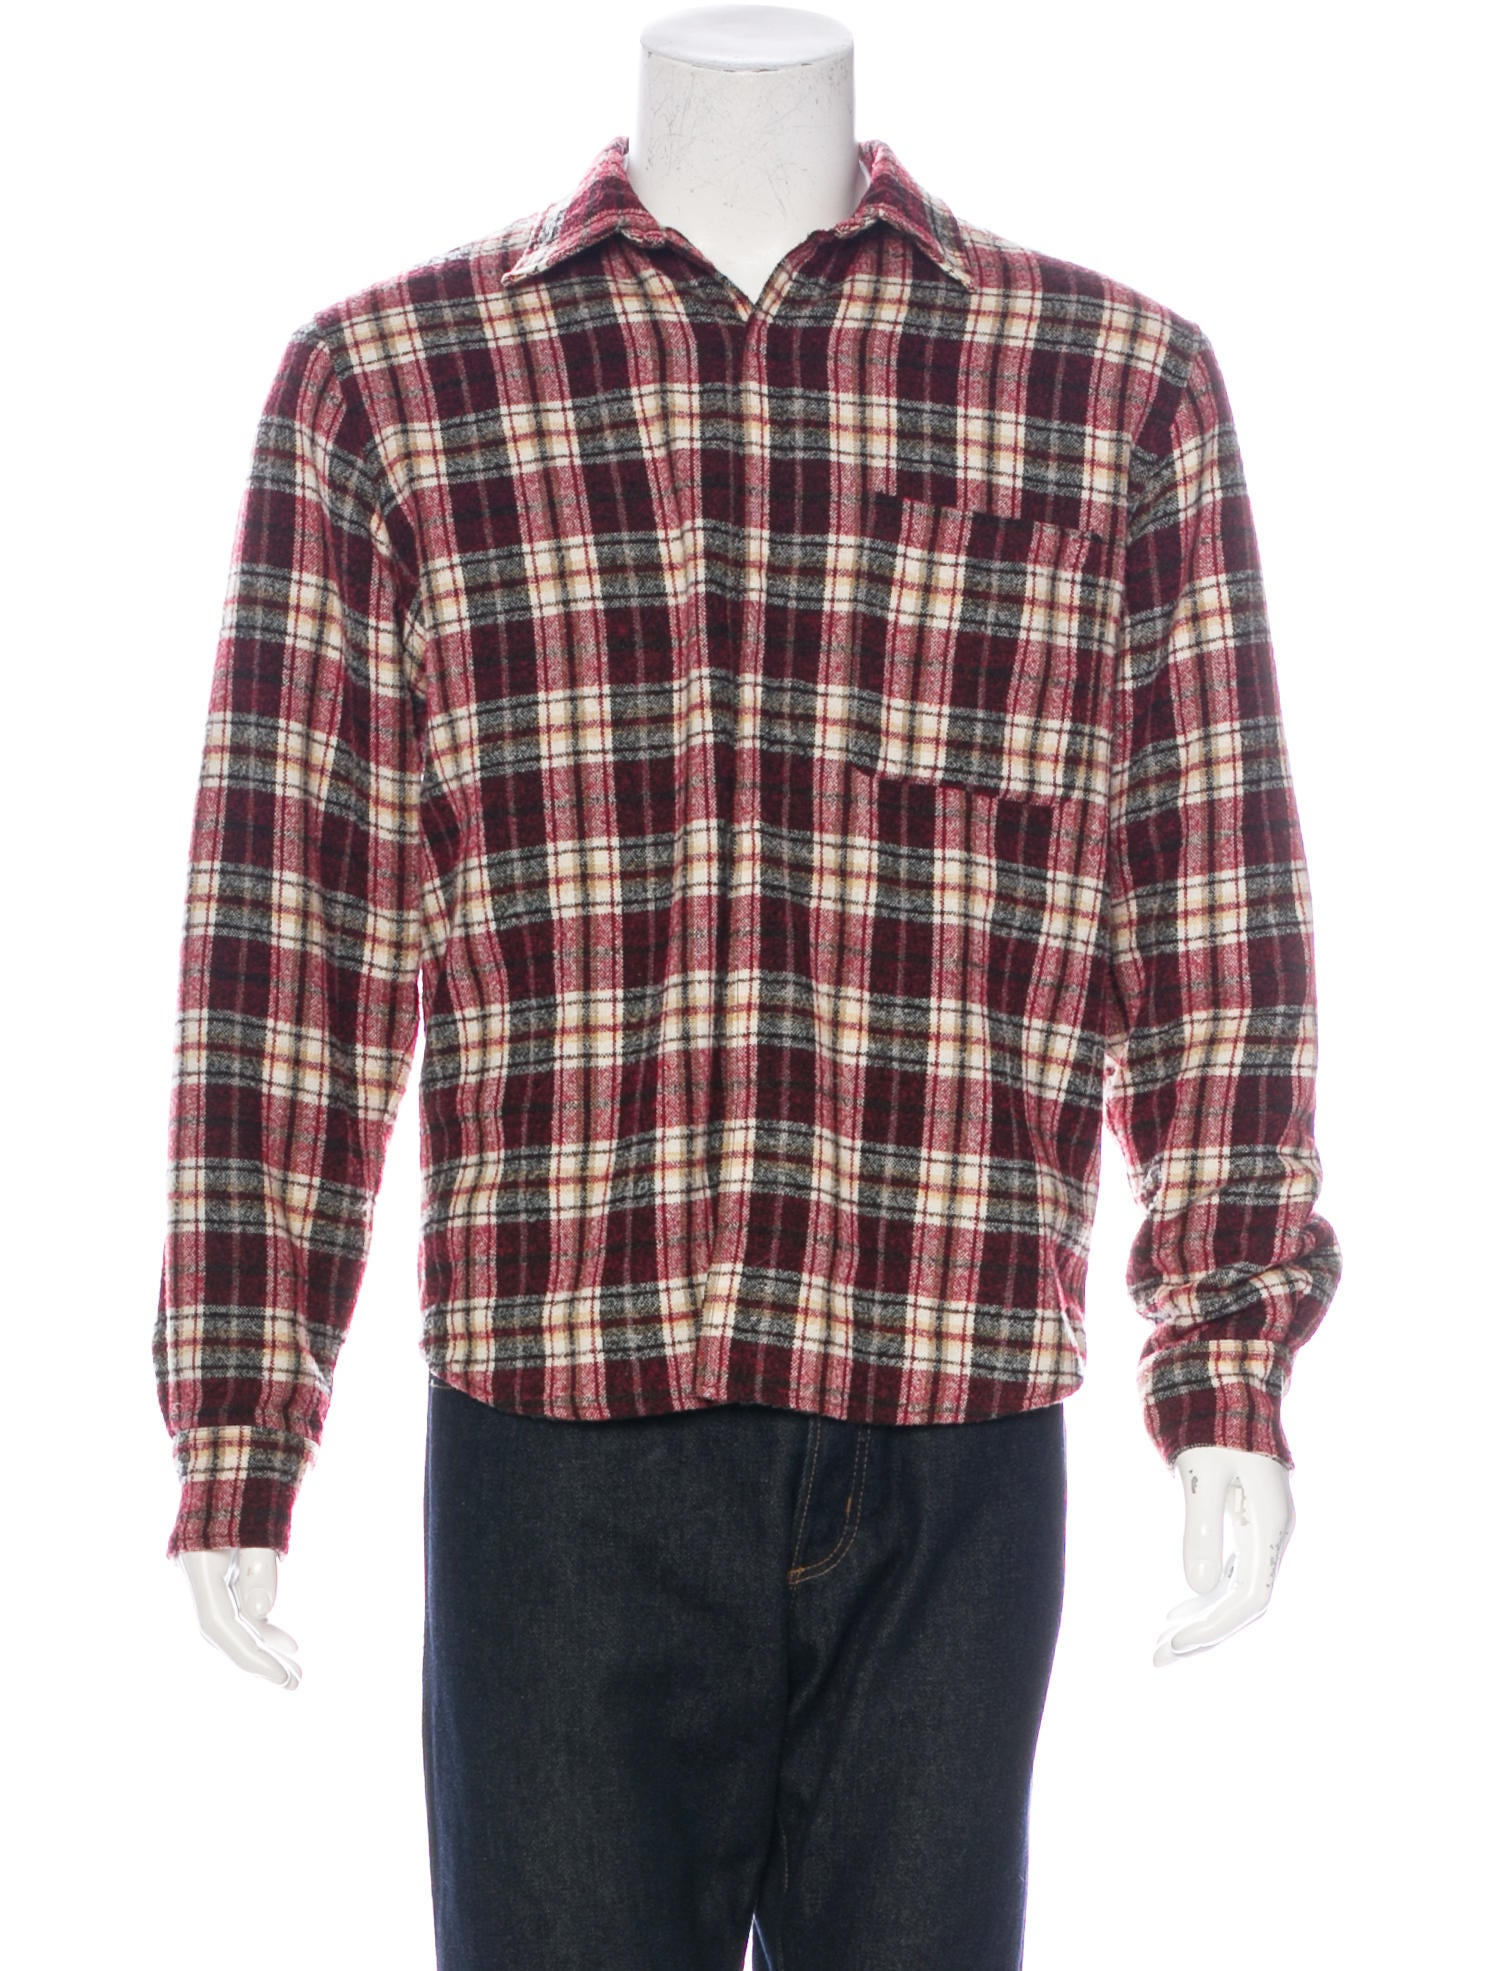 Umit benan wool flannel shirt clothing bnn20059 the for Mens wool flannel shirt